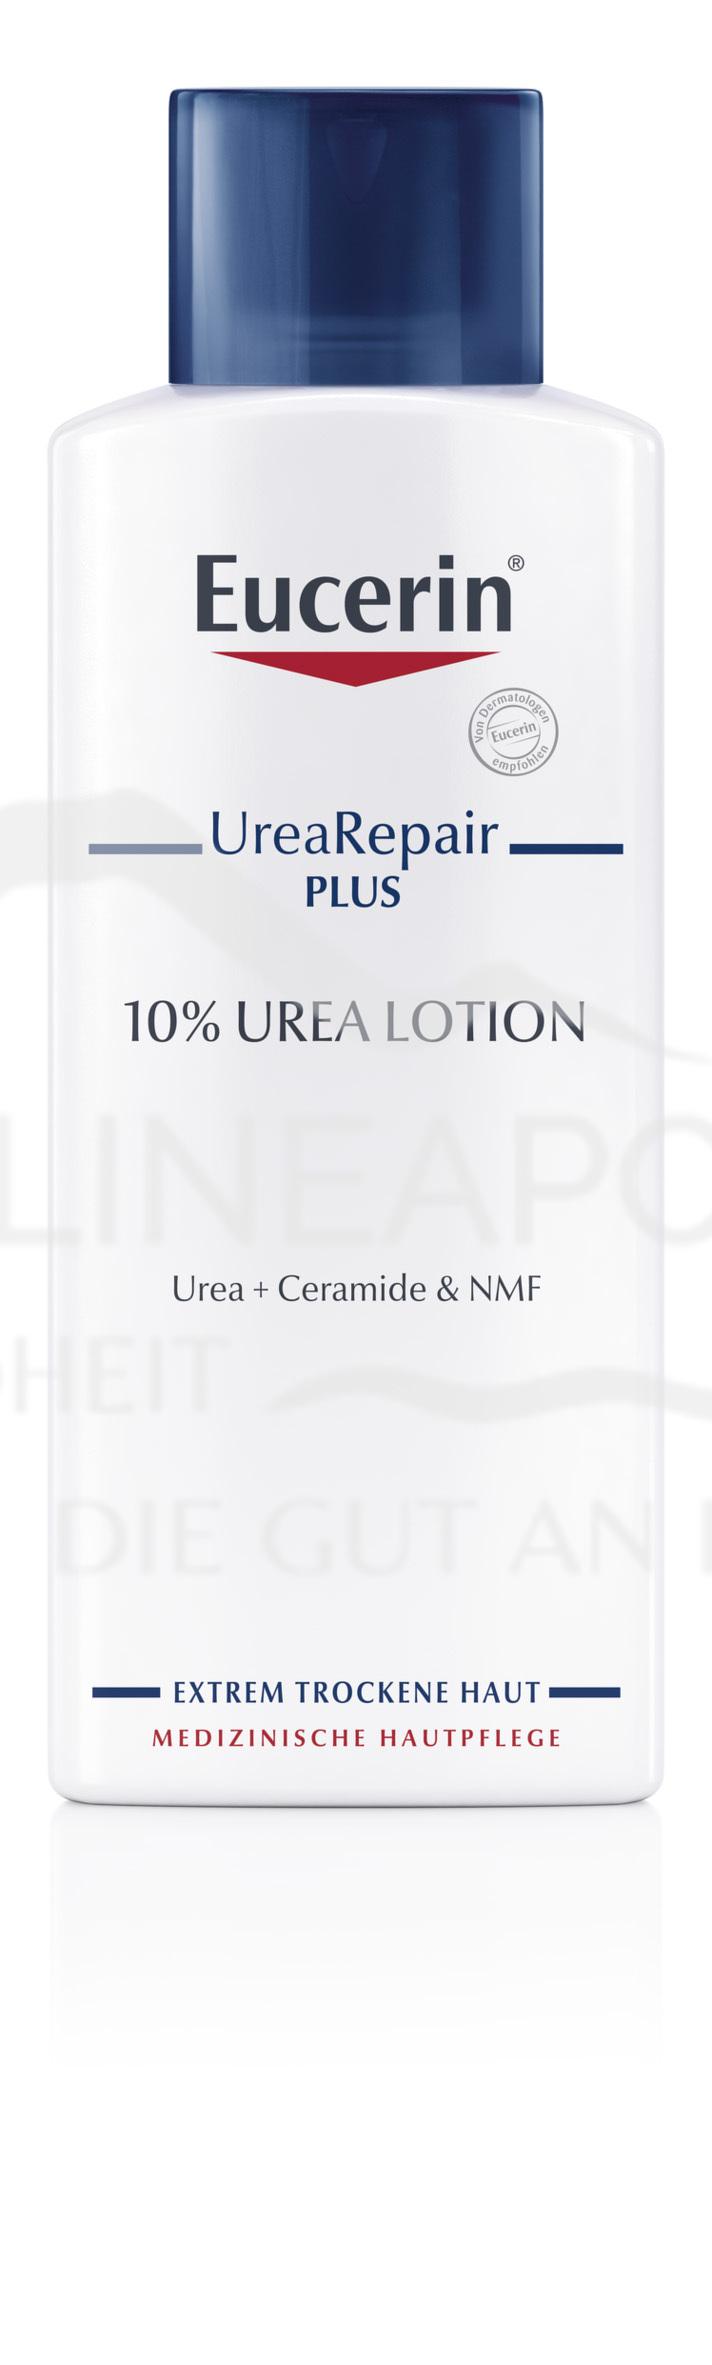 Eucerin COMPLETE REPAIR Lotion 10% Urea für sehr trockene Haut